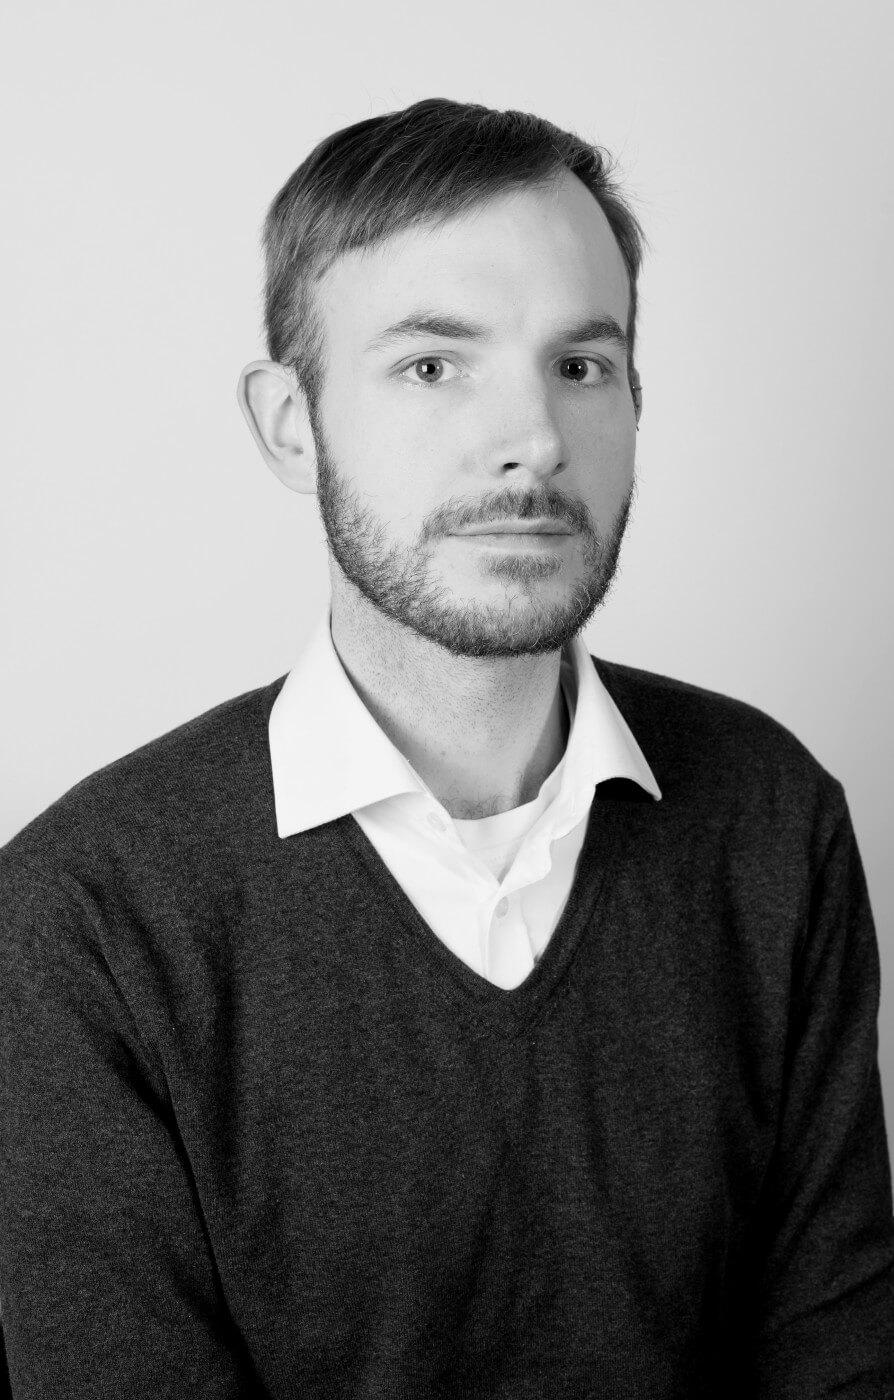 Image of Marcel Wrzesinski